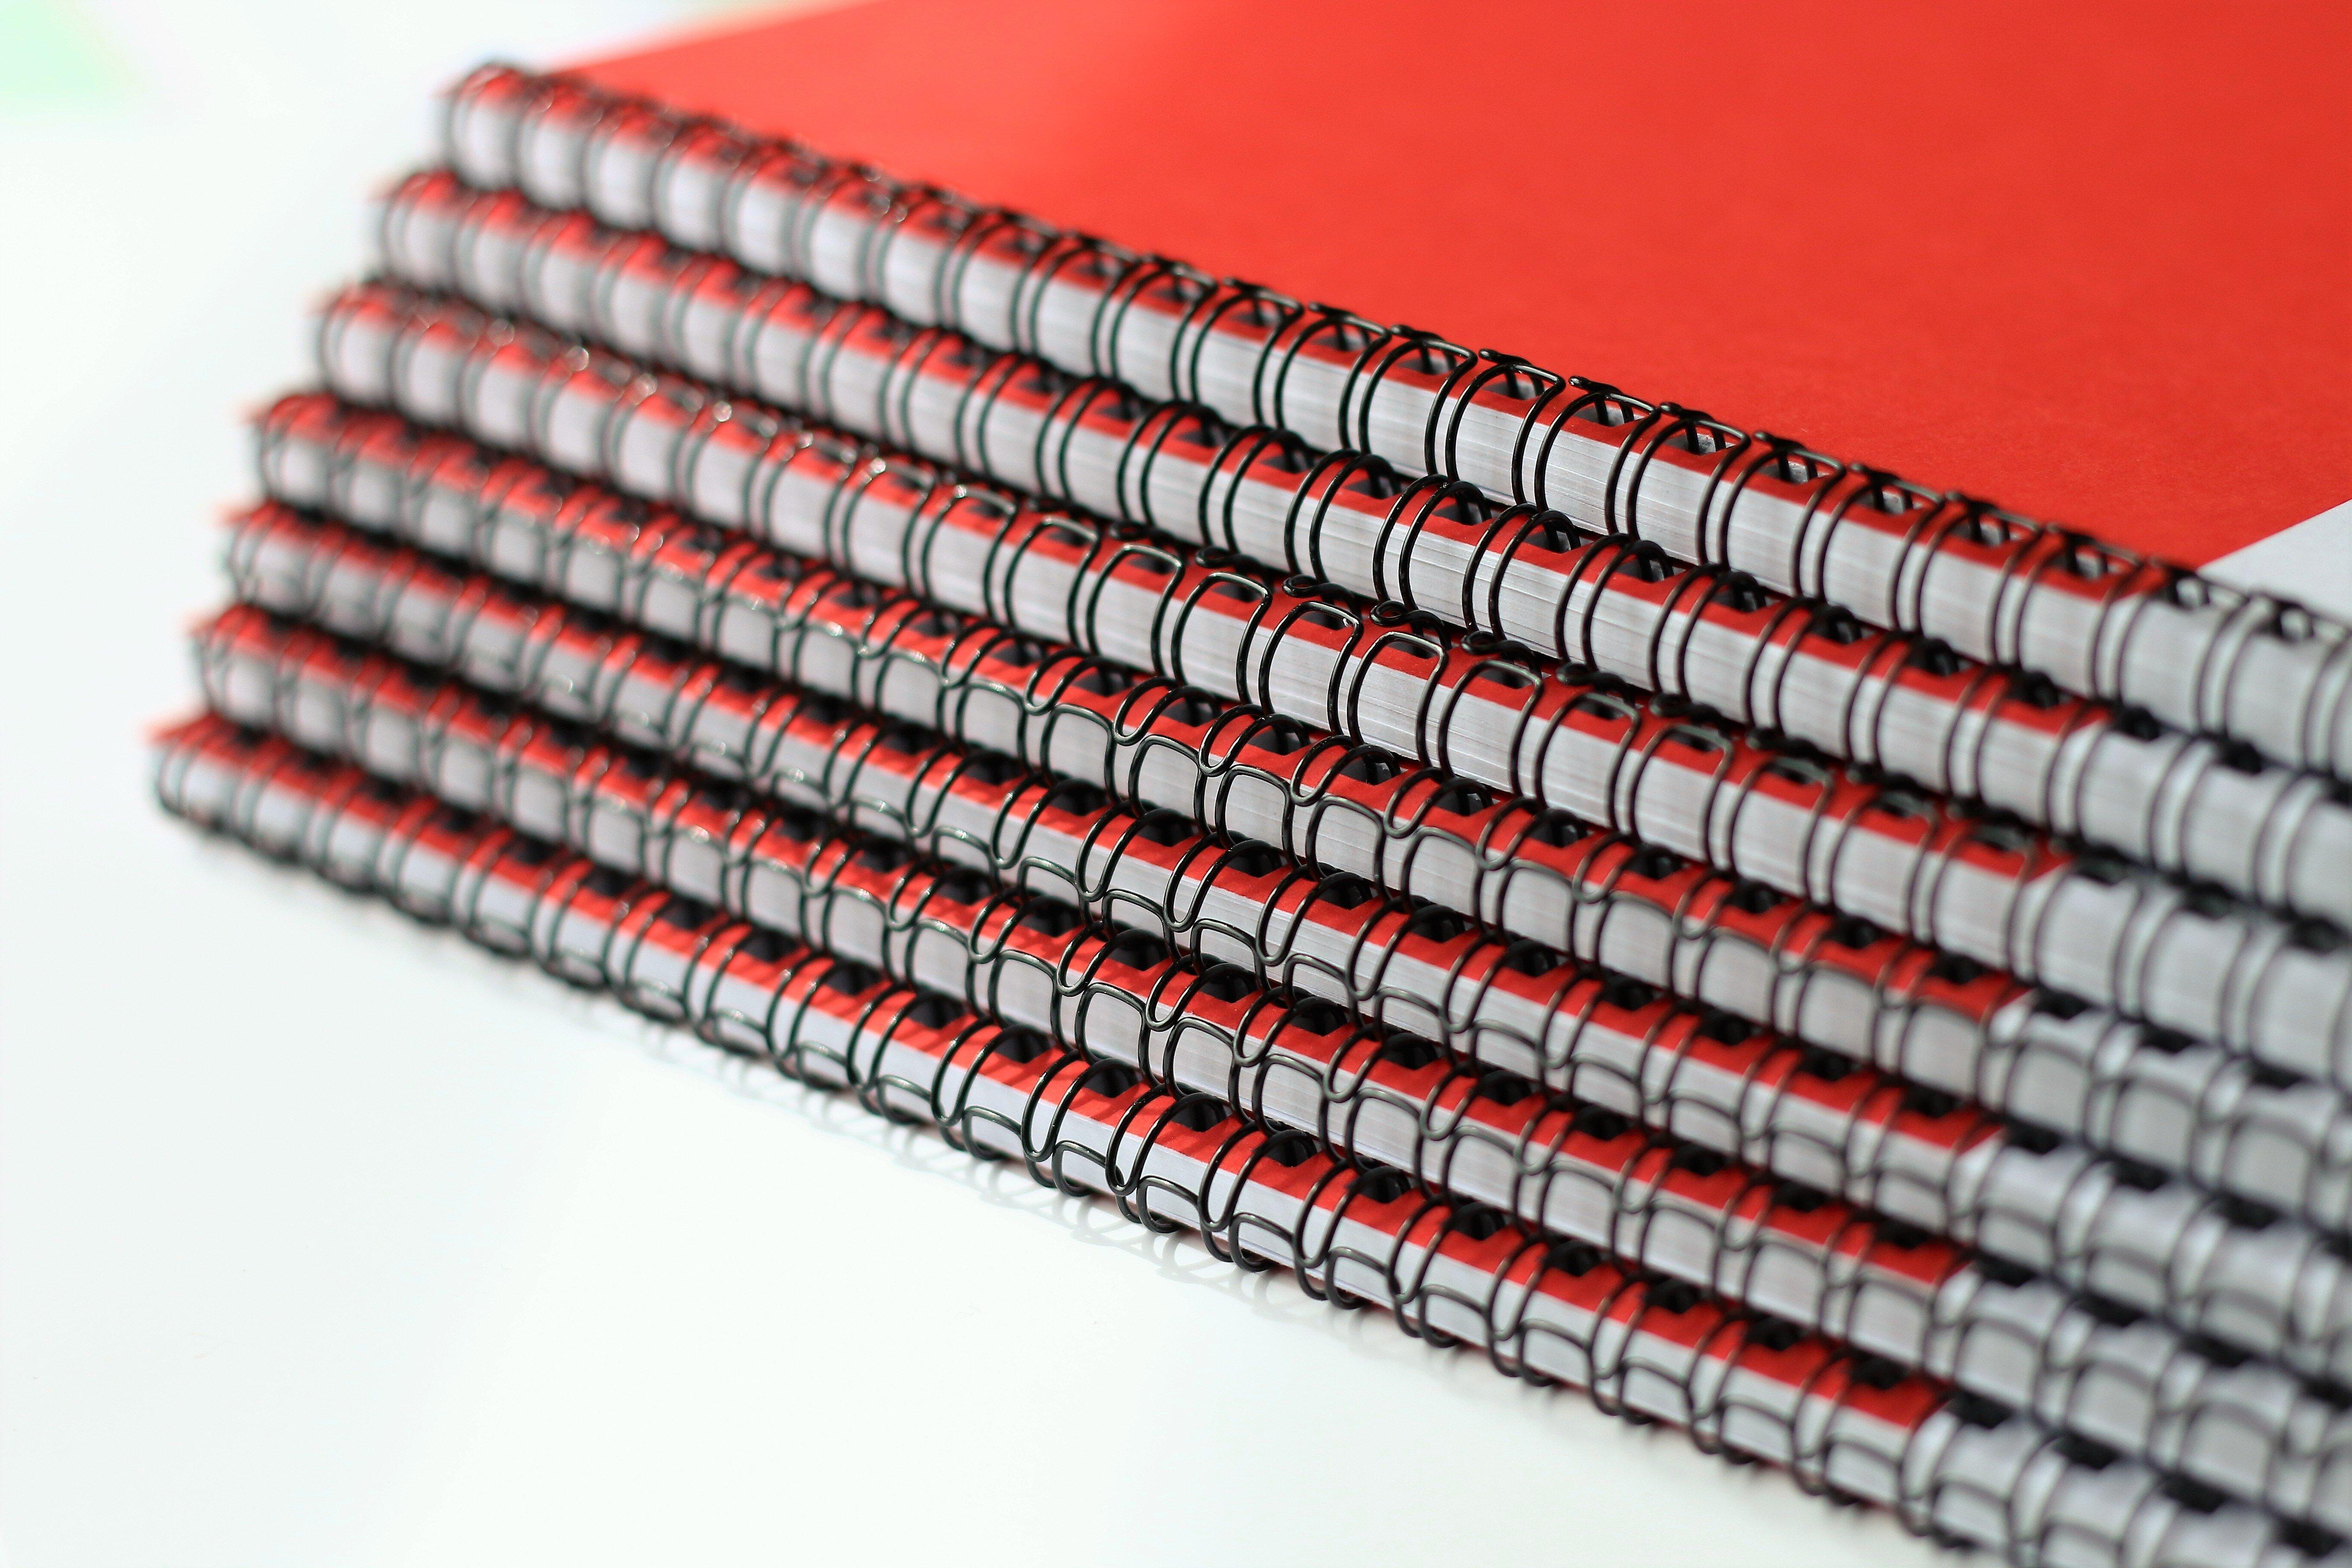 Printers Milton Keynes : Wide Range Of Printing Services : SJ Print MK